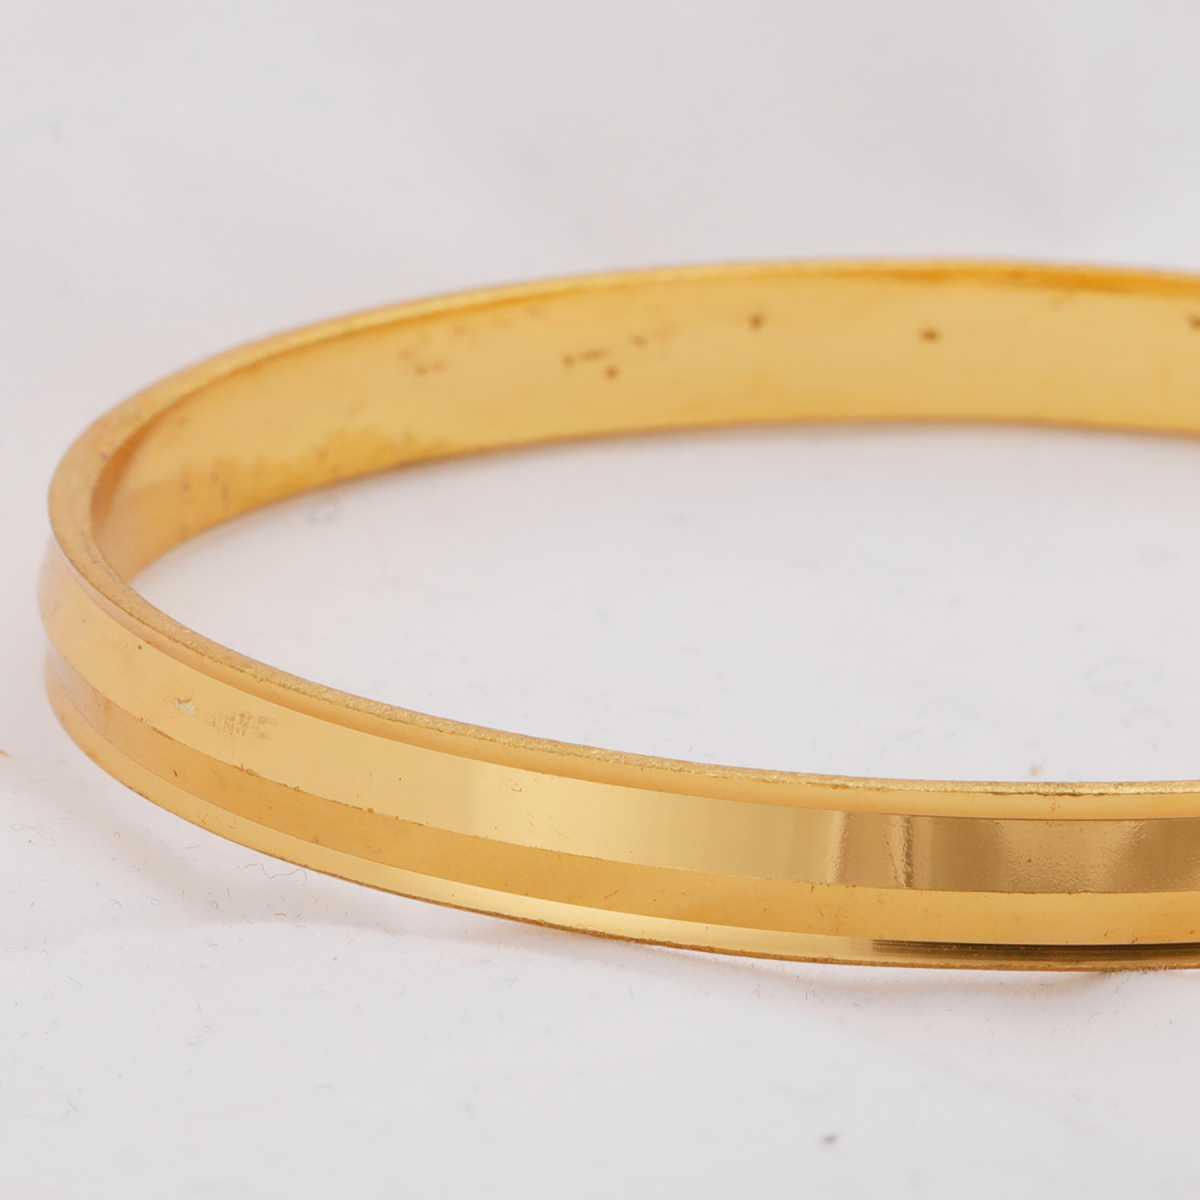 Silver Shine Gold colour Plated Metal Premium Textured Glossy Finish Punjabi kada Bangle Bracelet for Boys and Mens.